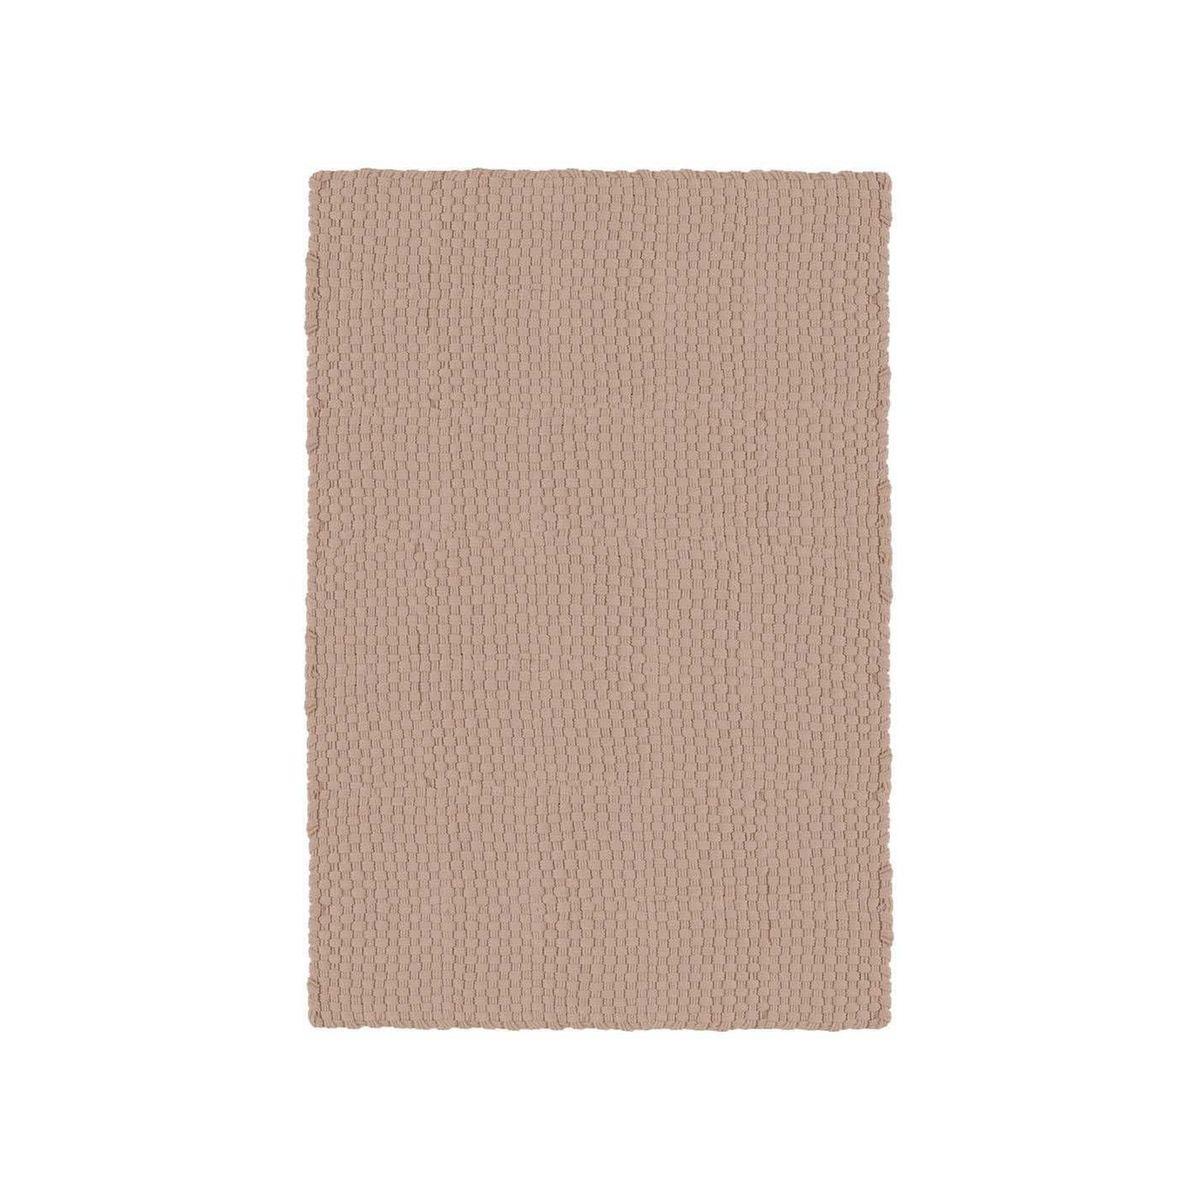 Tapis Corde 8030 Tapis Tapis Coton Et Couleurs Naturelles